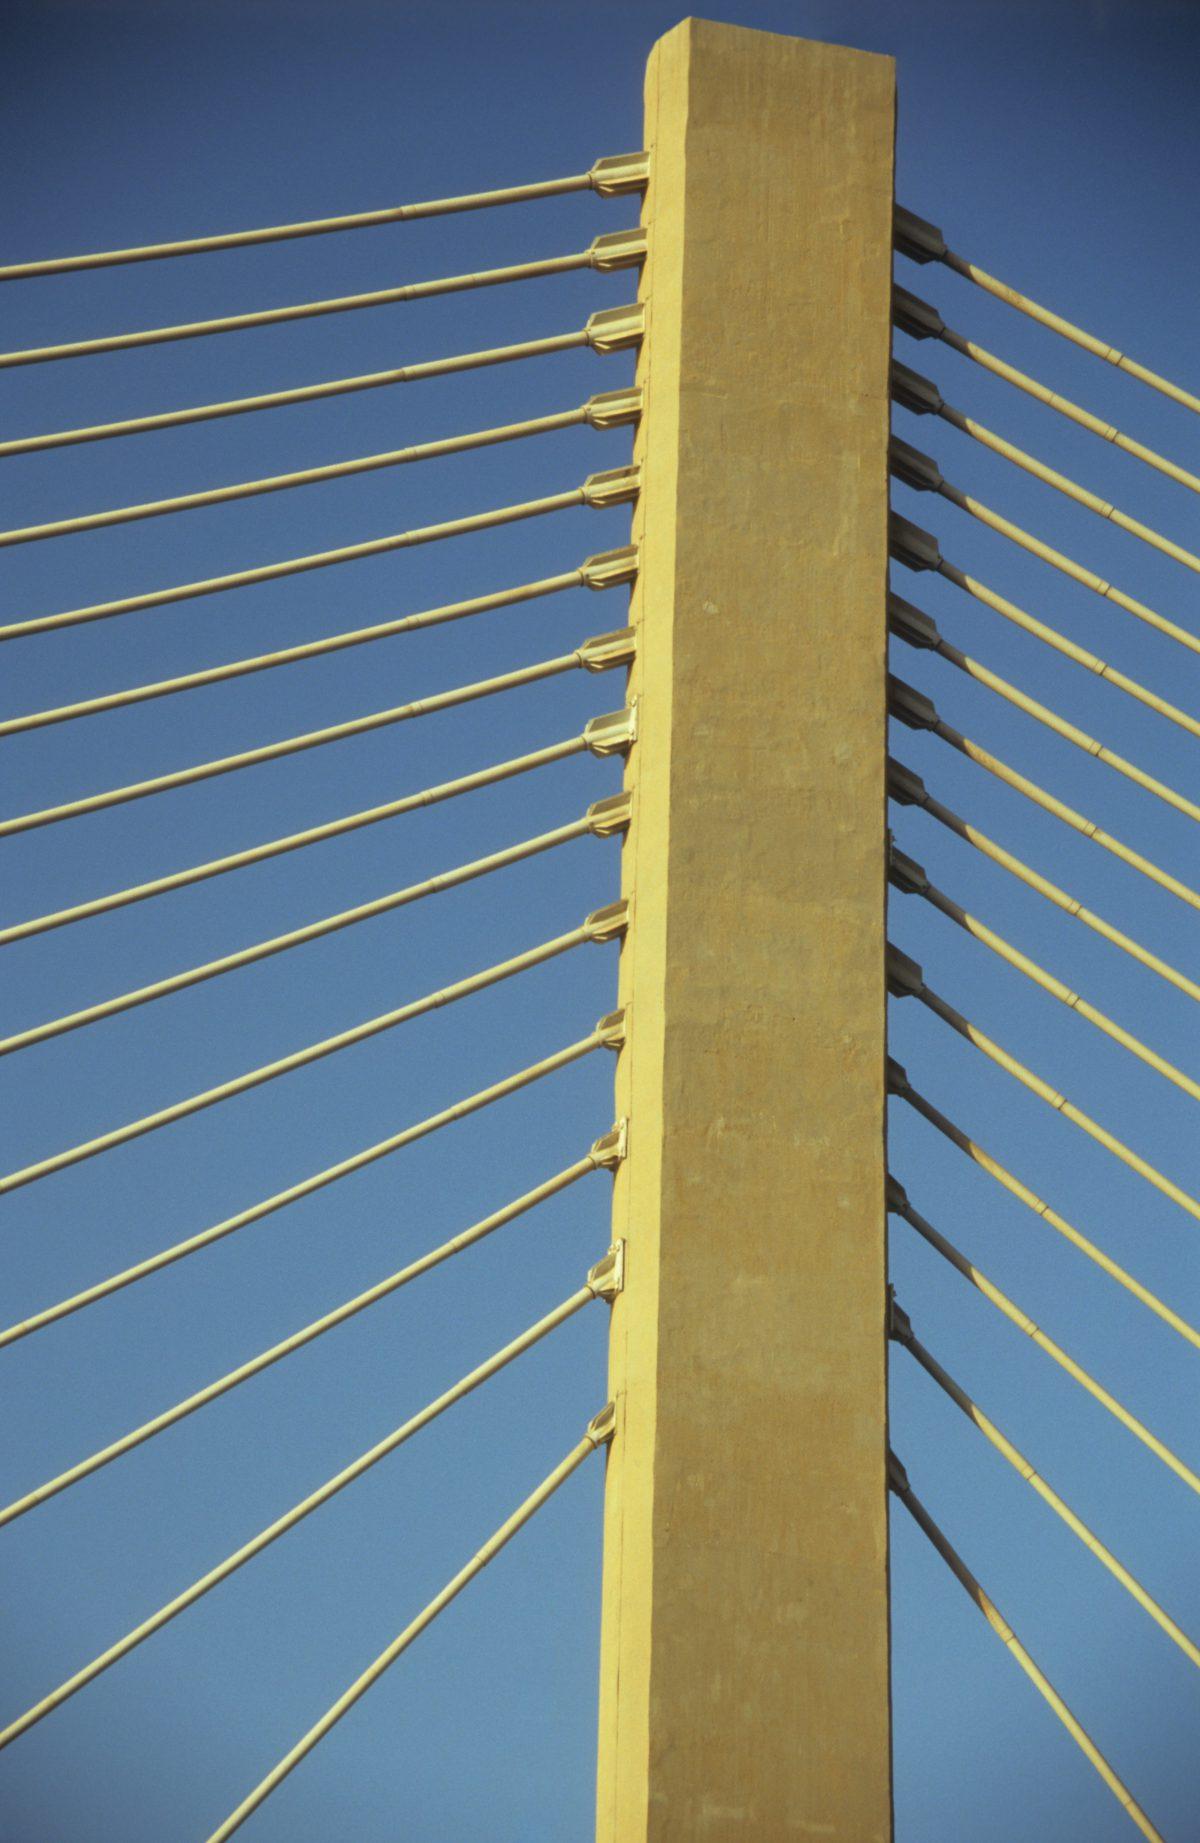 Bridge, bridge, sky